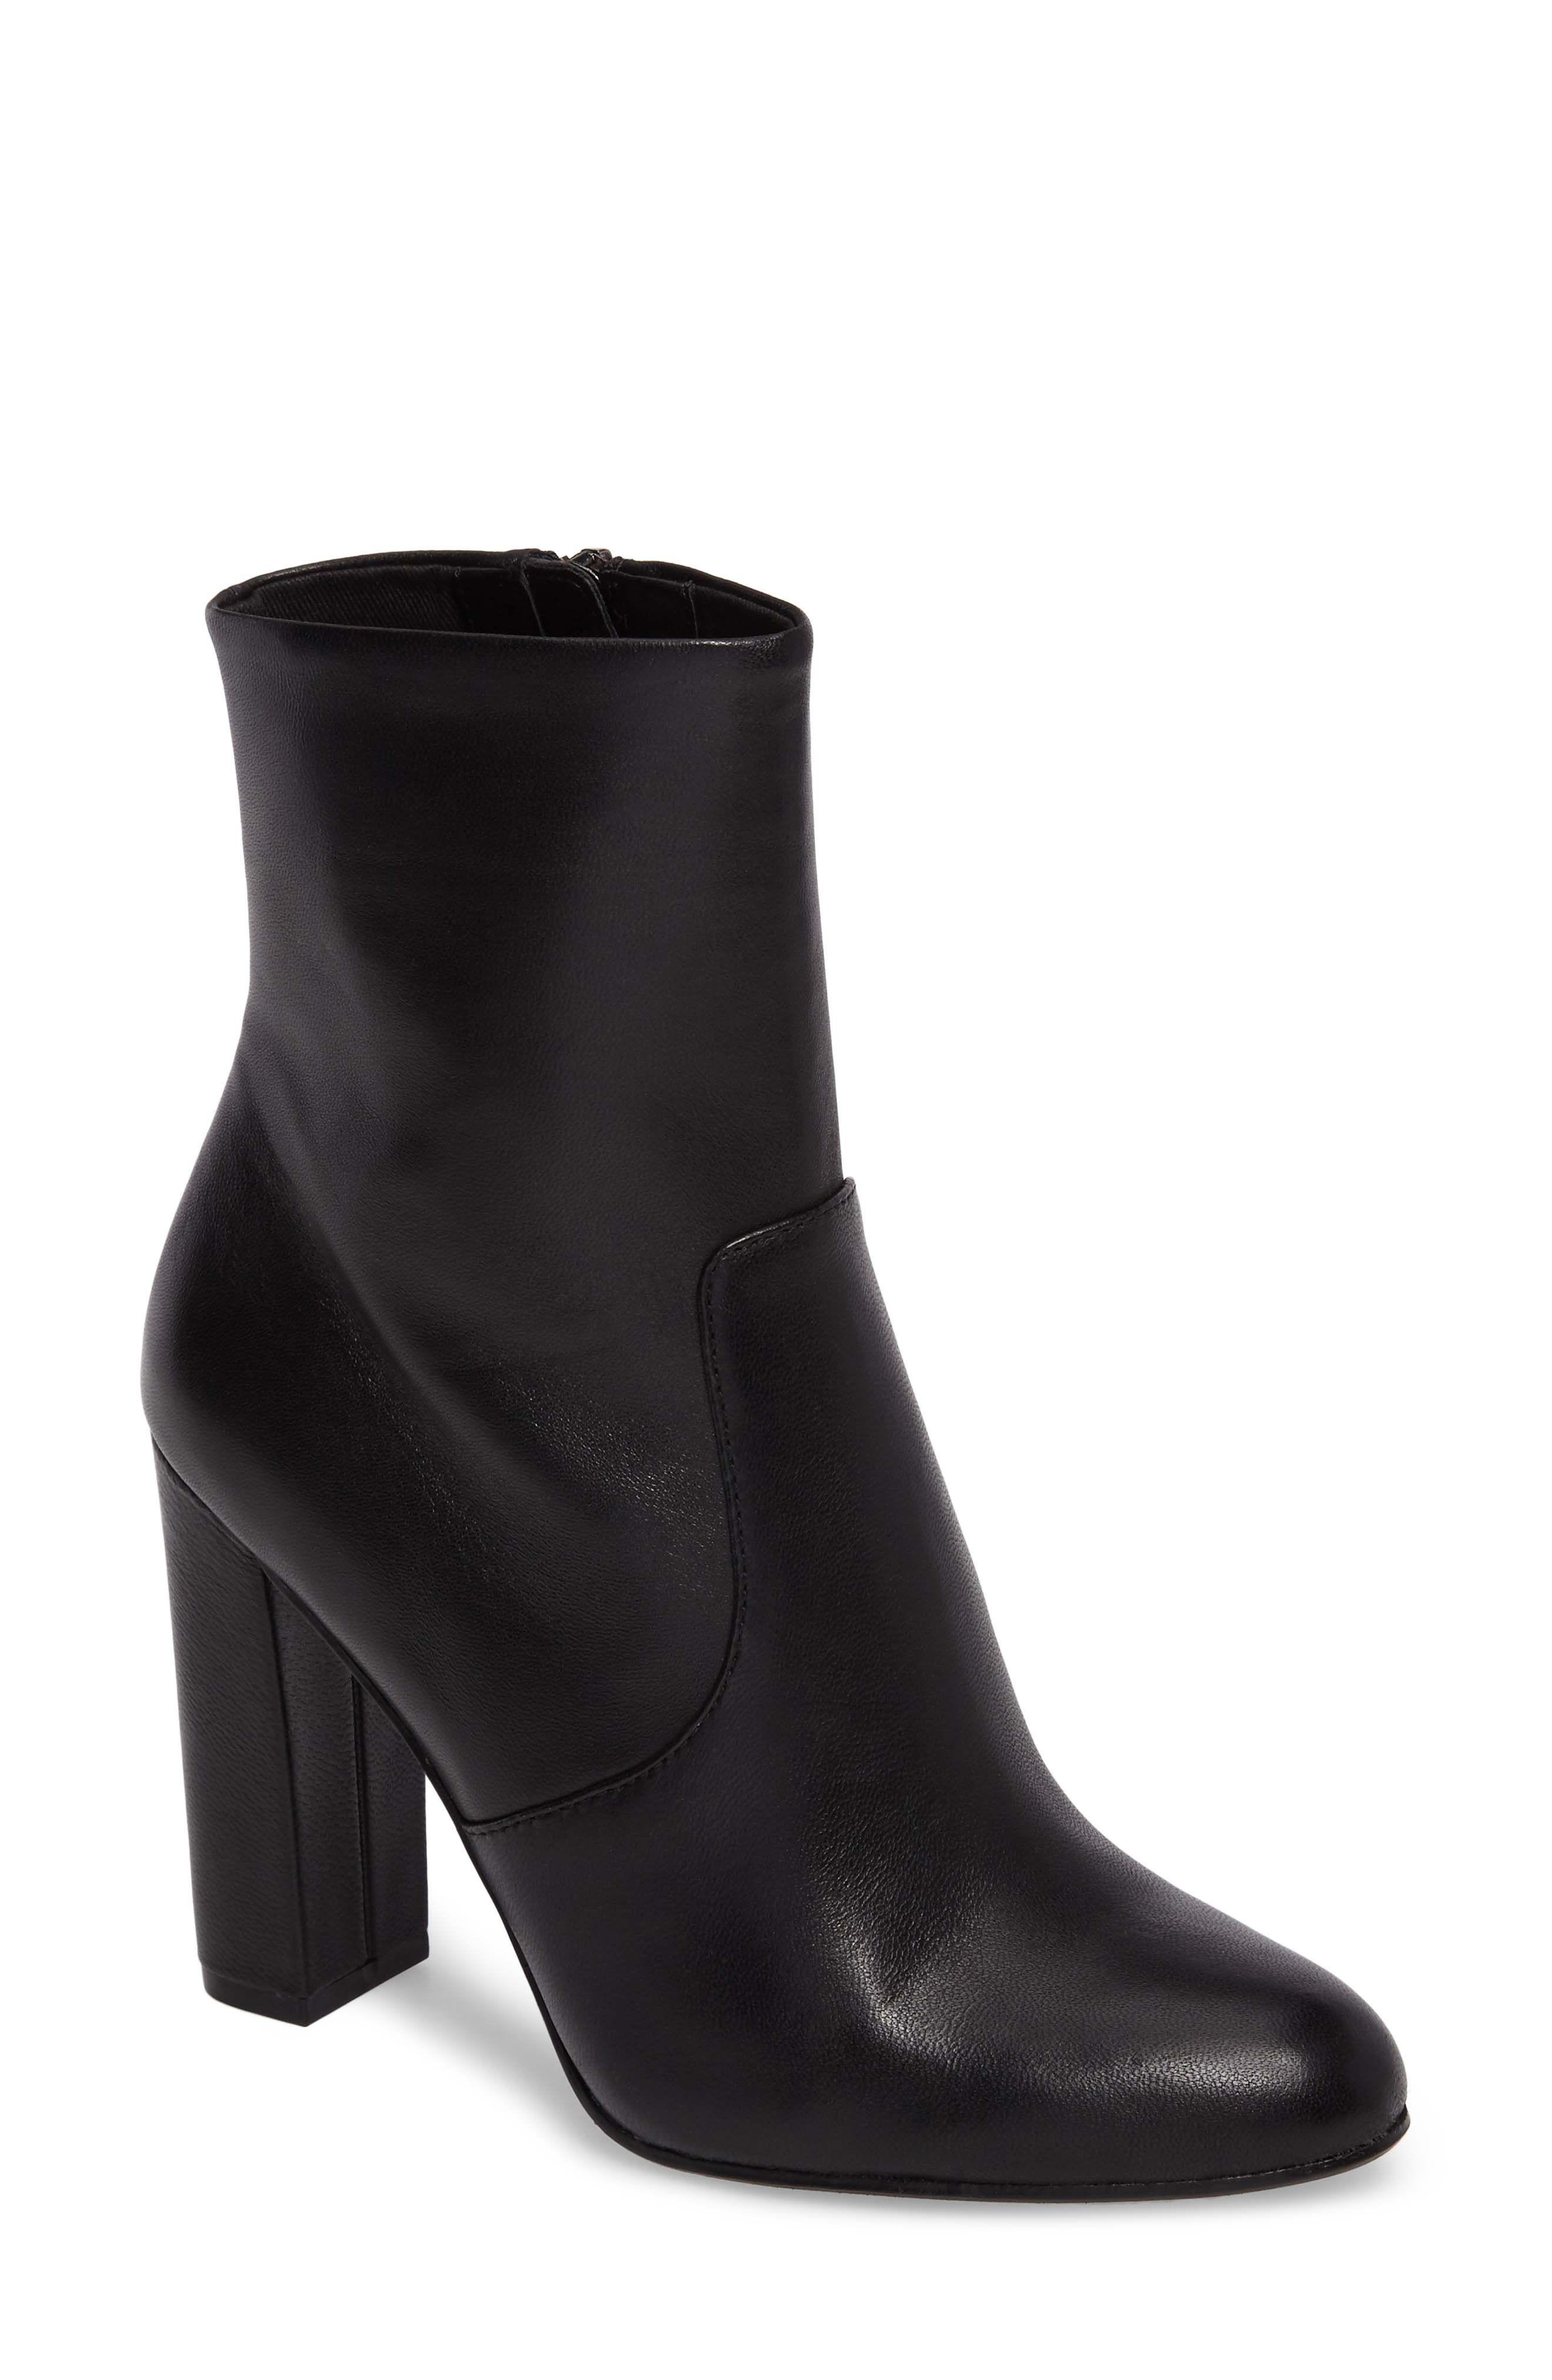 f1c3fd9dceb84 STEVE MADDEN | Editor Block Heel Bootie #Shoes #Boots #STEVE MADDEN ...